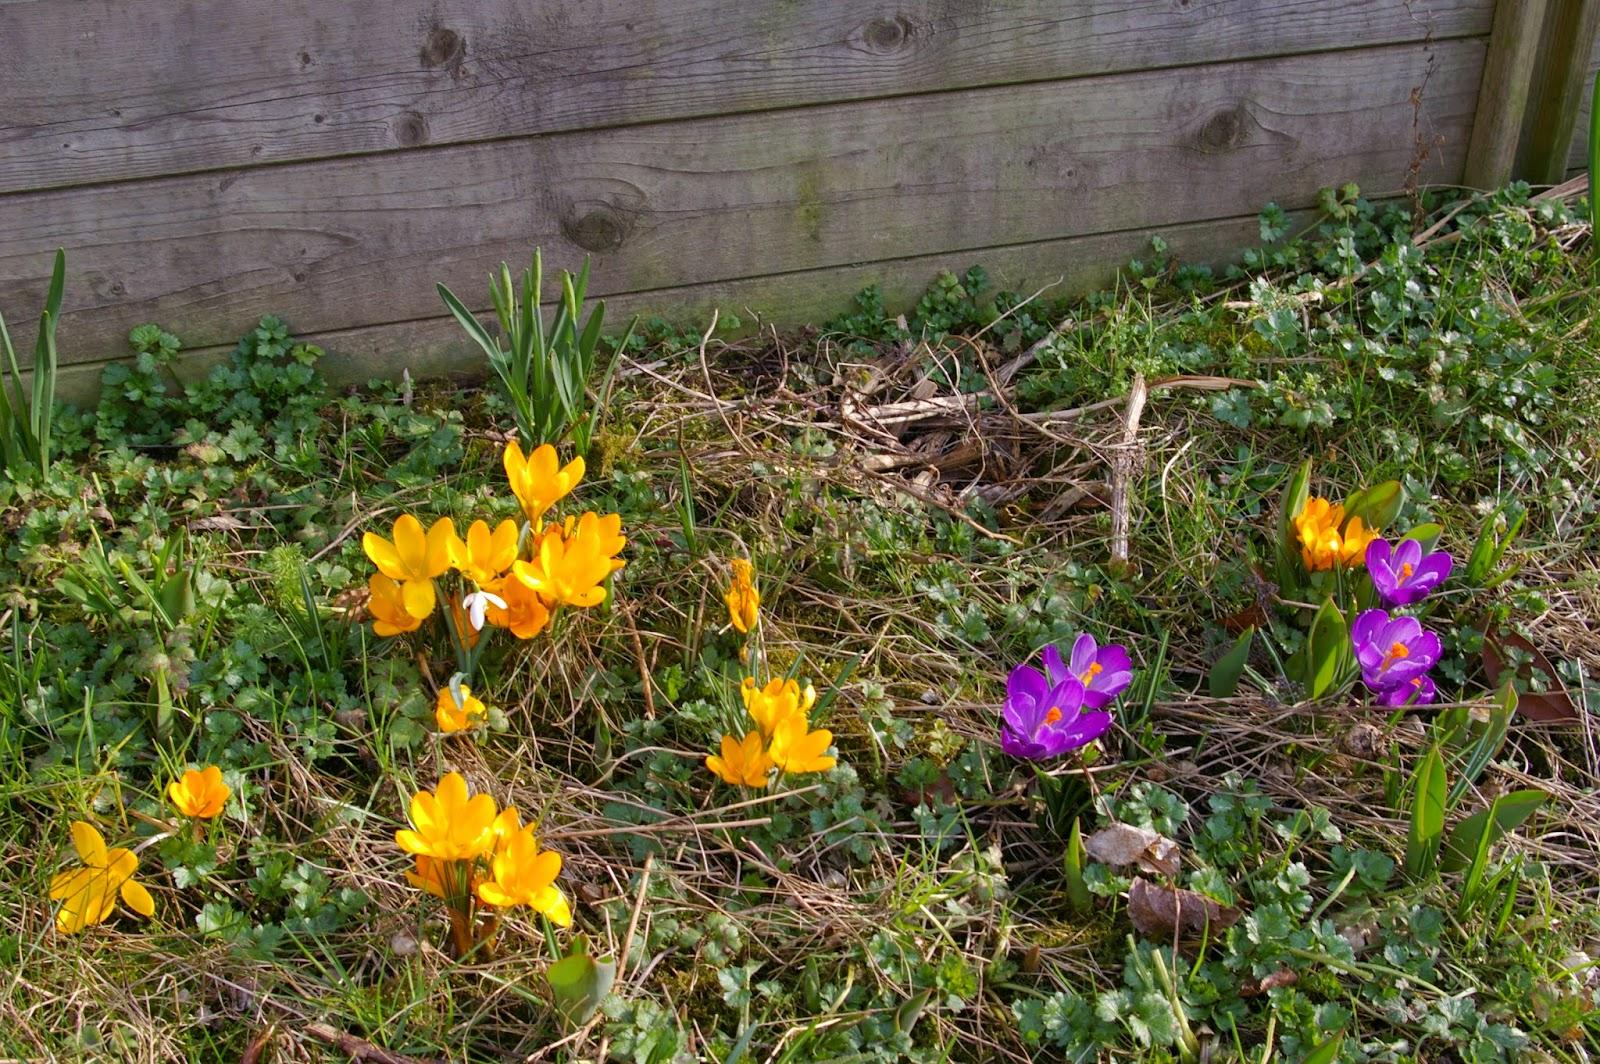 Le jardin de ryuma mars 2015 for Jardin mars 2015